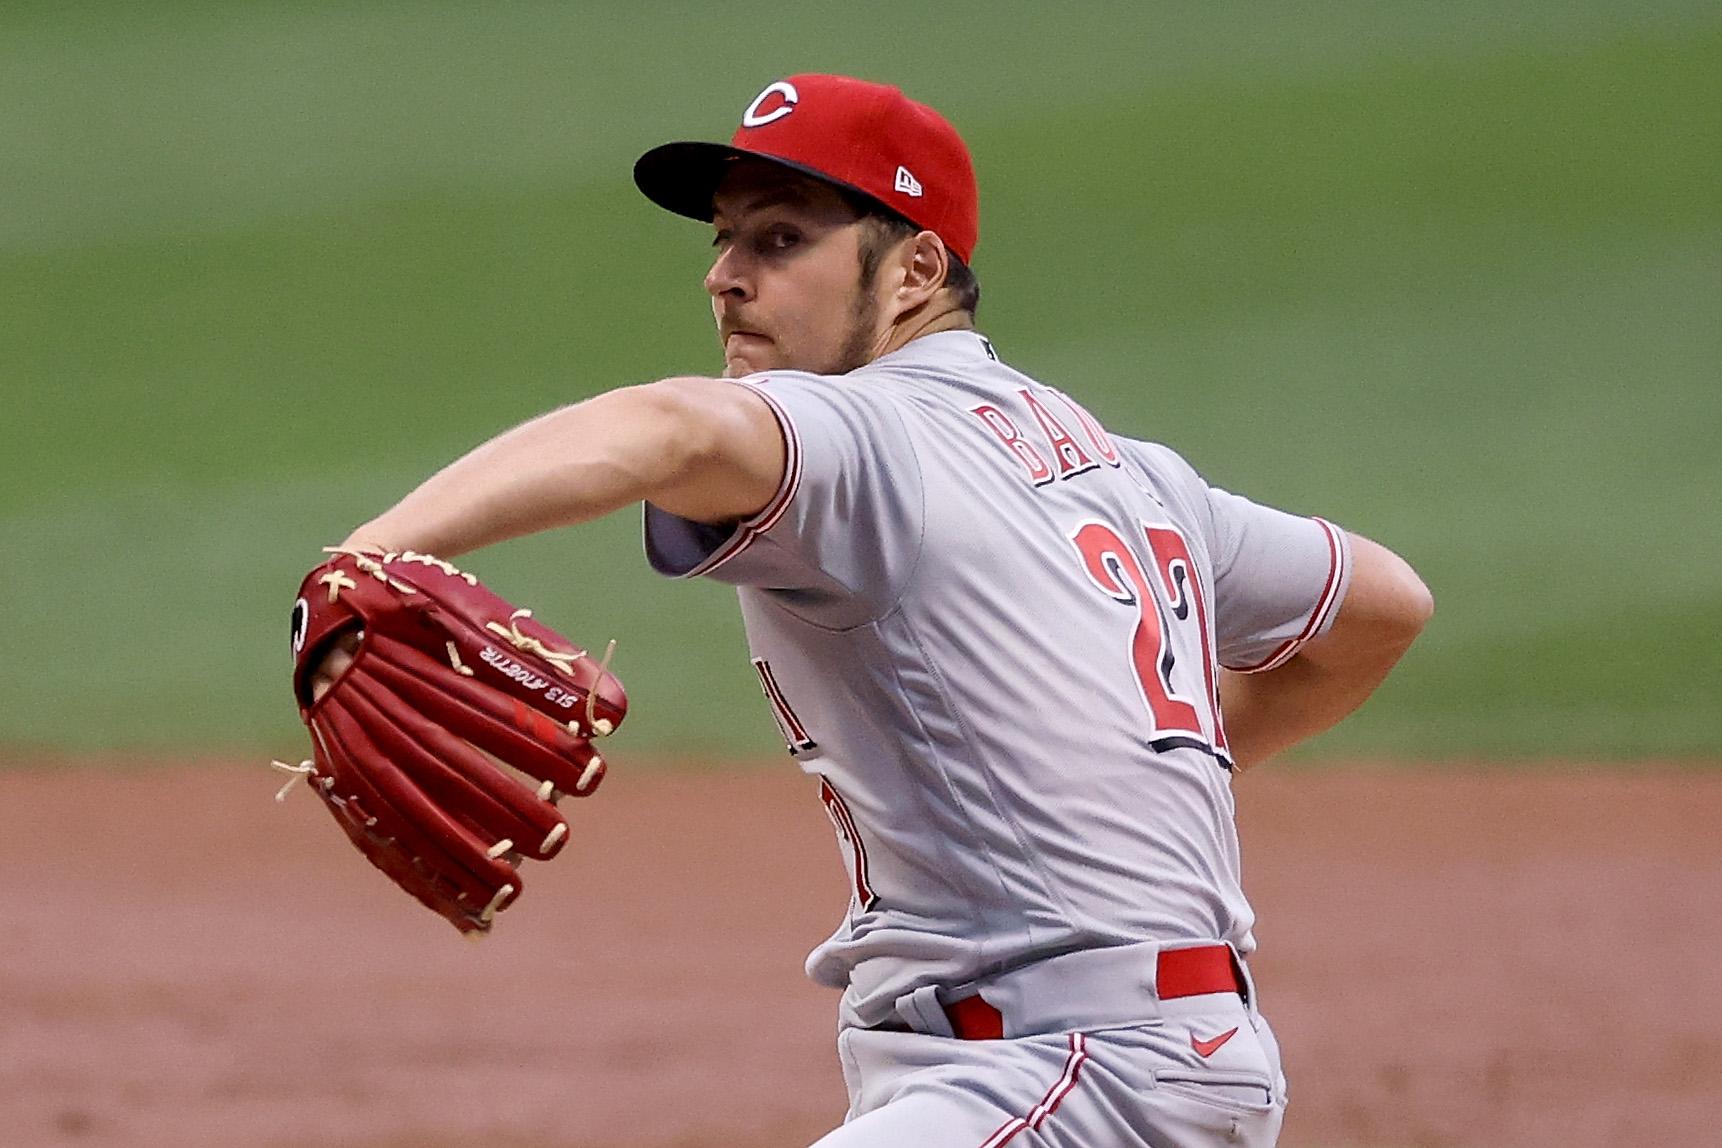 Cincinnati Reds Pitcher Trevor Bauer Continues to Blast Scott Boras and His Ego